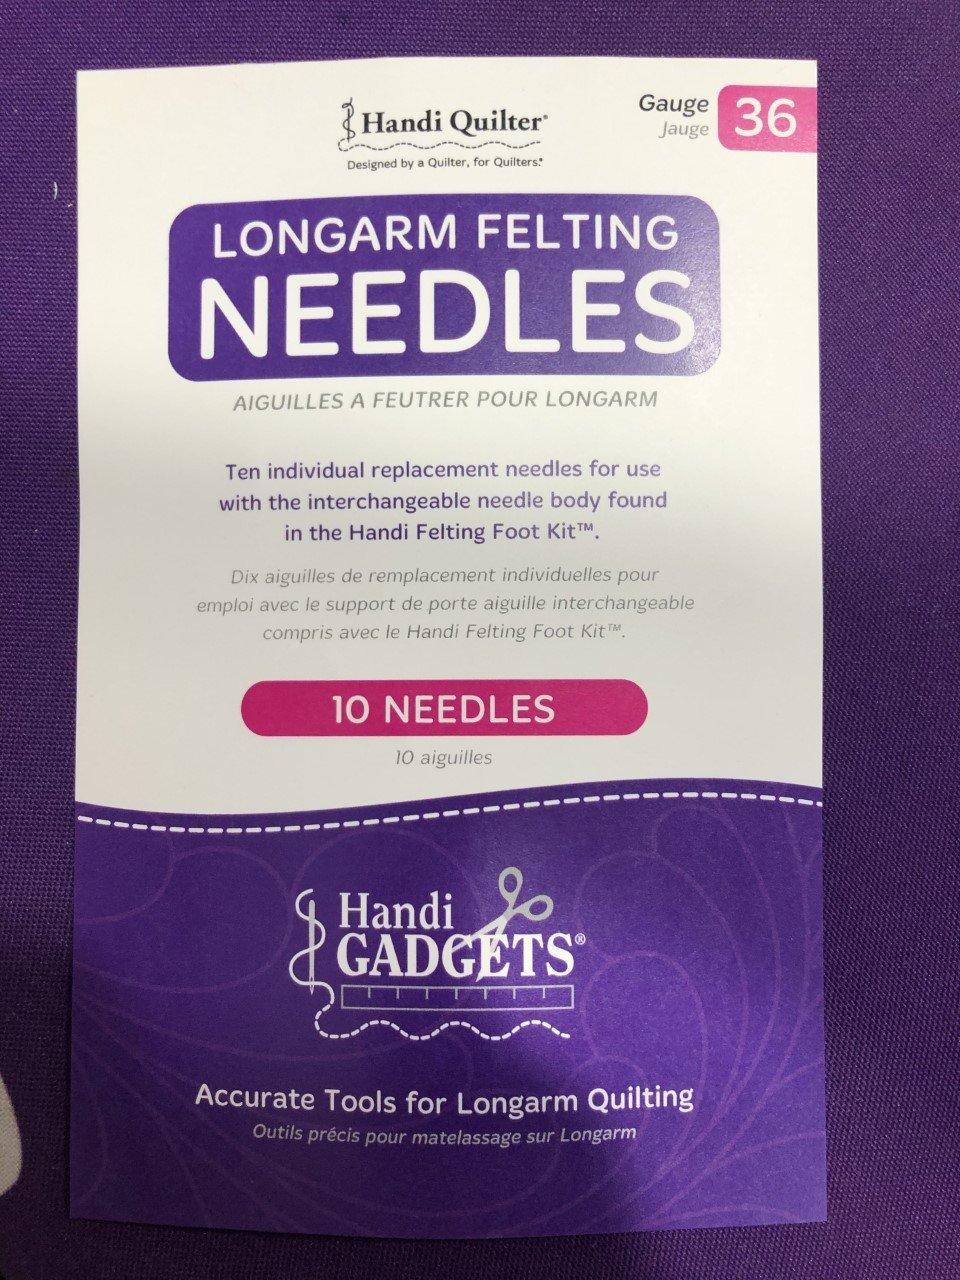 Handi Quilter Longarm Felting Needles 36 Gauge/10 Pack QM00241